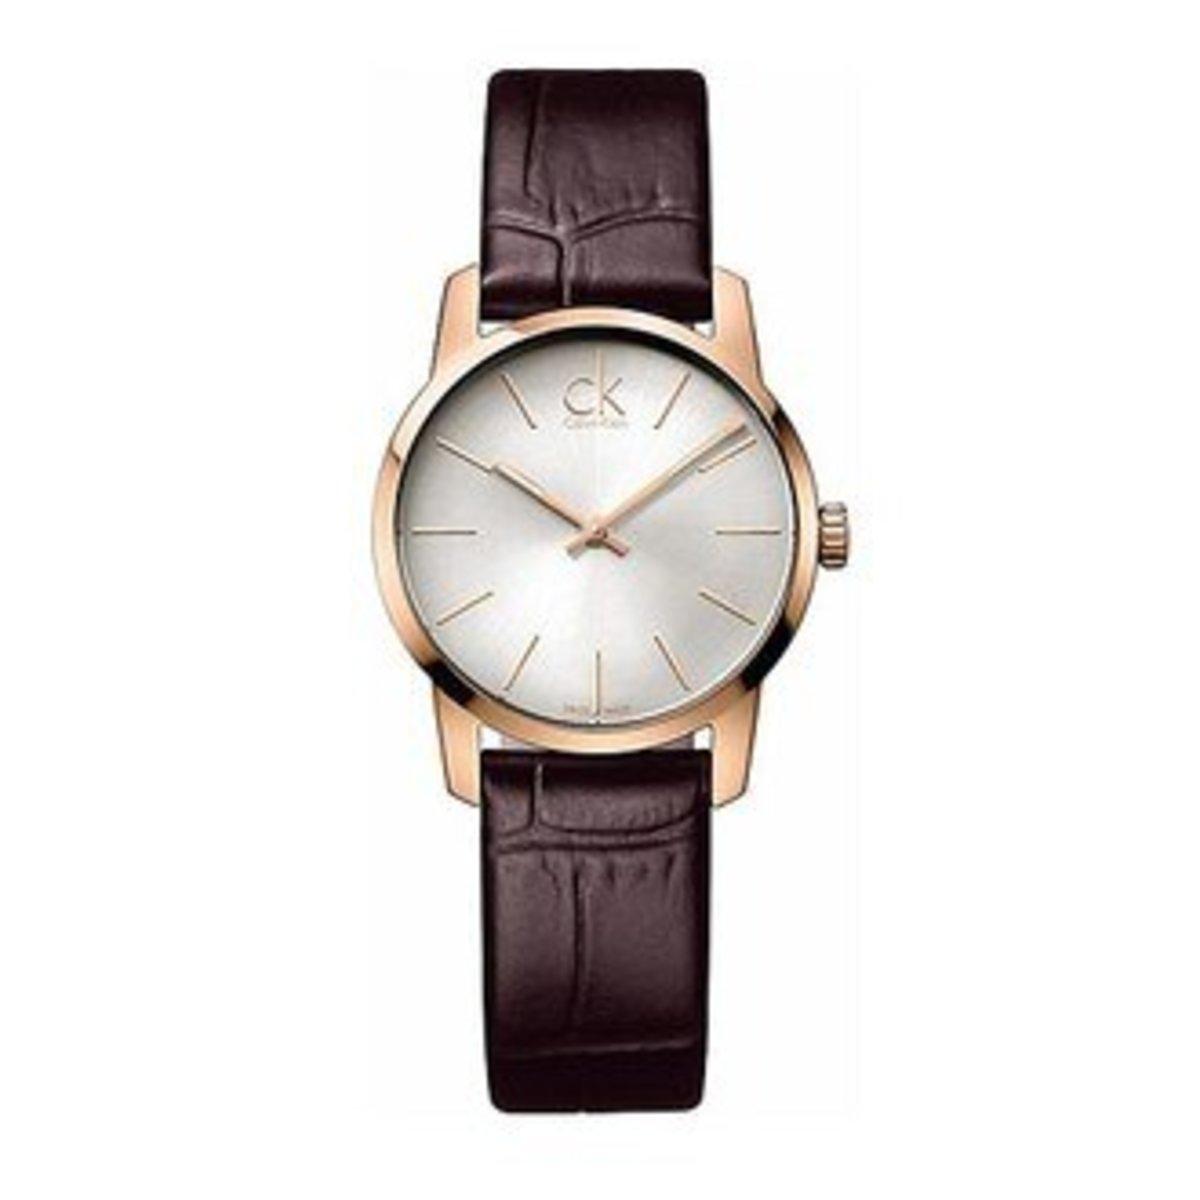 CK City - Ladies Watches - K2G23620 (Parallel Import Goods)